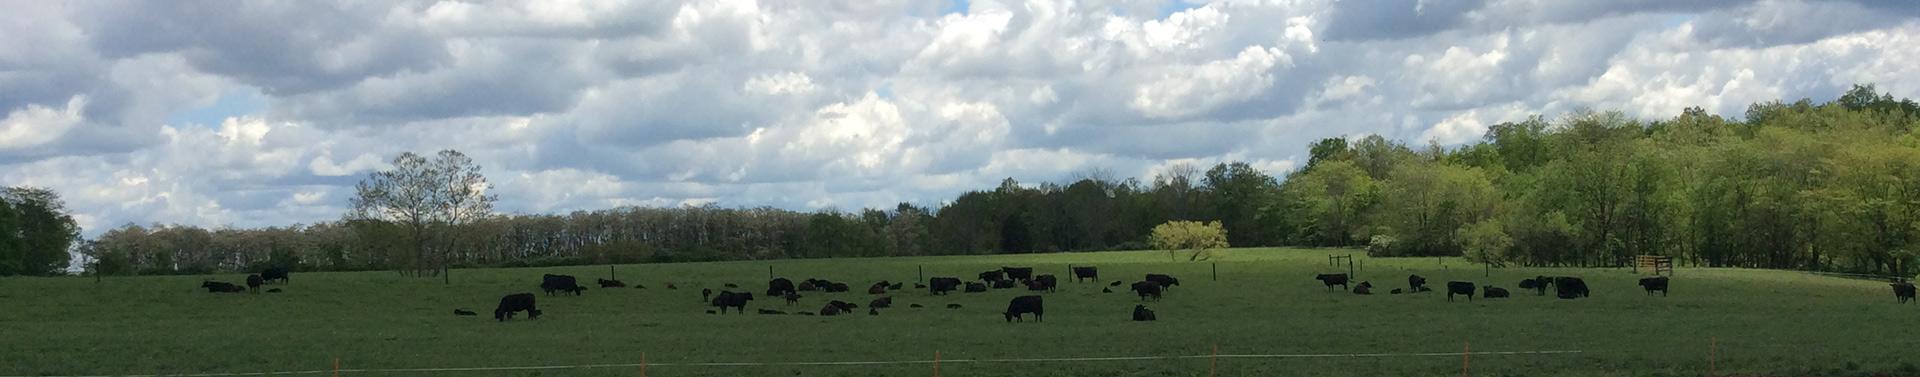 CowBackground